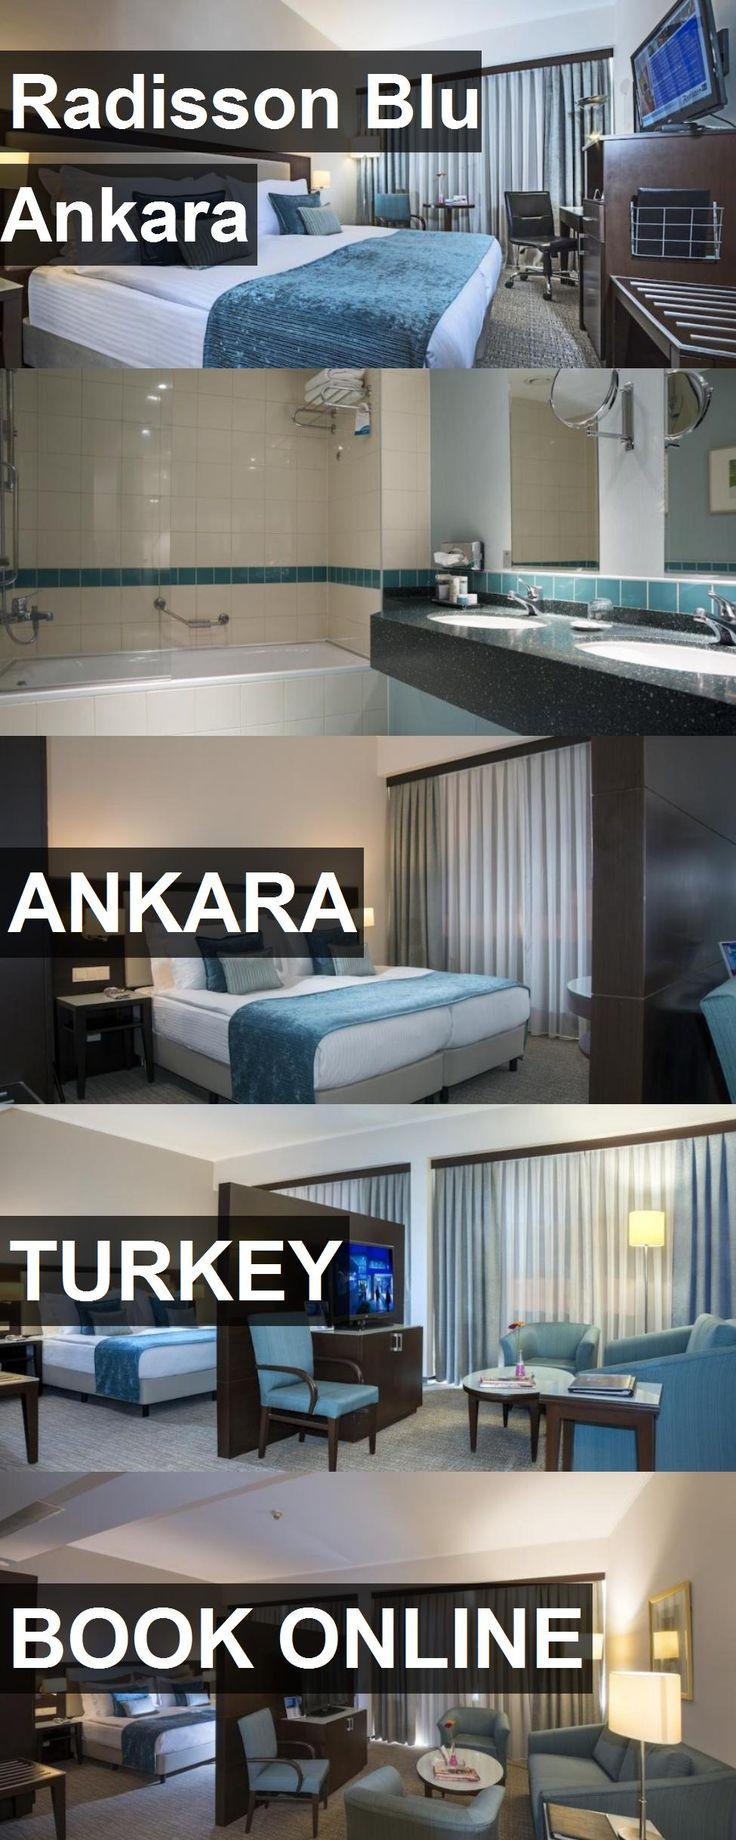 Hotel Radisson Blu Ankara in Ankara, Turkey. For more information, photos, reviews and best prices please follow the link. #Turkey #Ankara #RadissonBluAnkara #hotel #travel #vacation